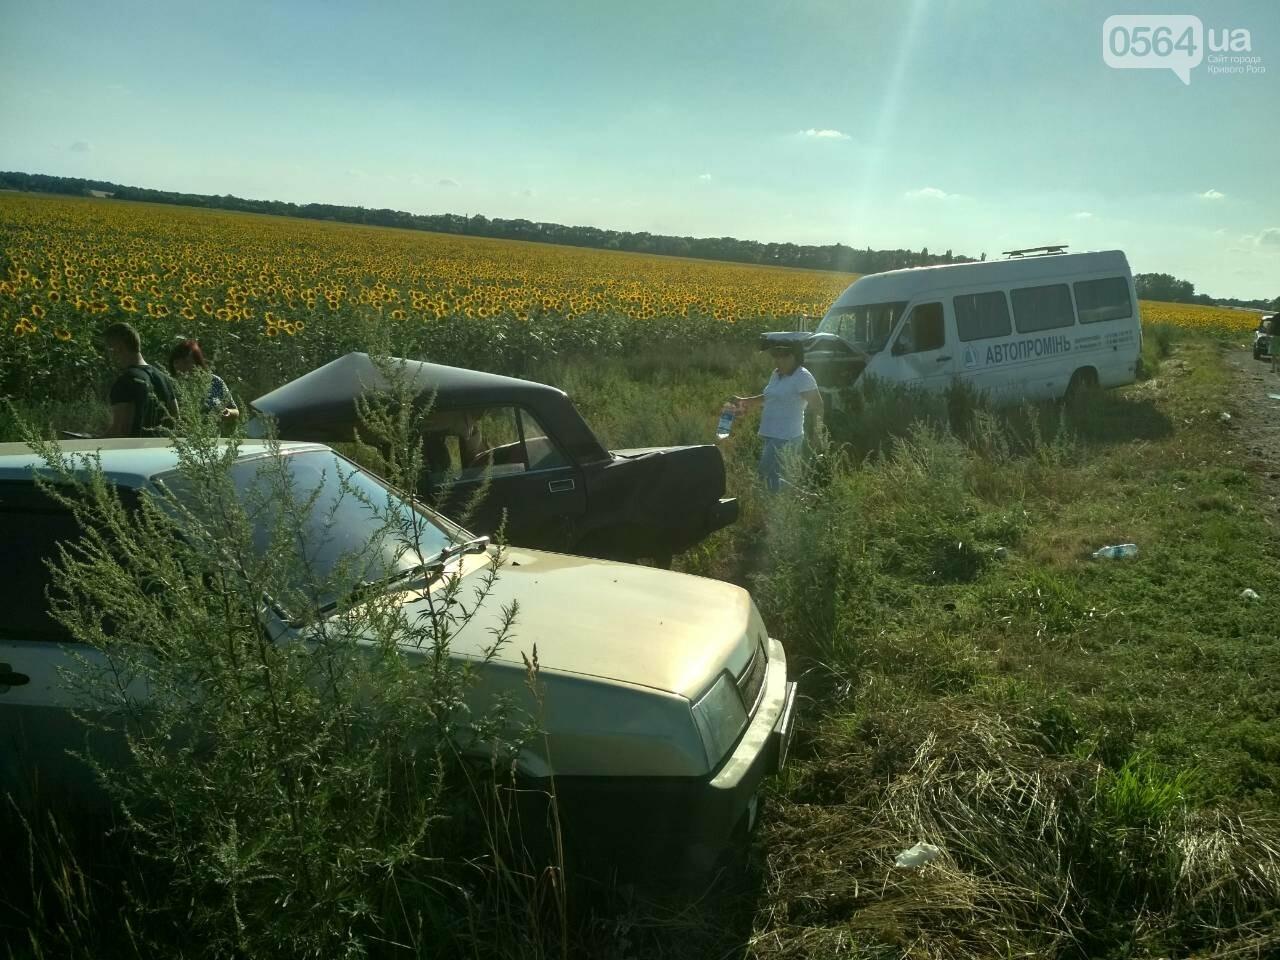 На Днепропетровщине столкнулись маршрутка и 2 легковушки. Один человек погиб, - ФОТО, фото-2